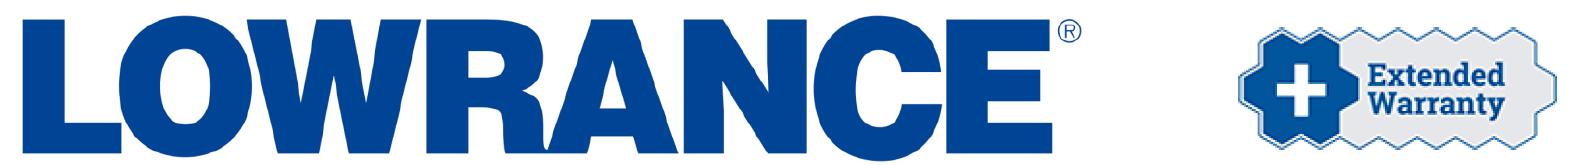 extended-warranty-logo.jpg